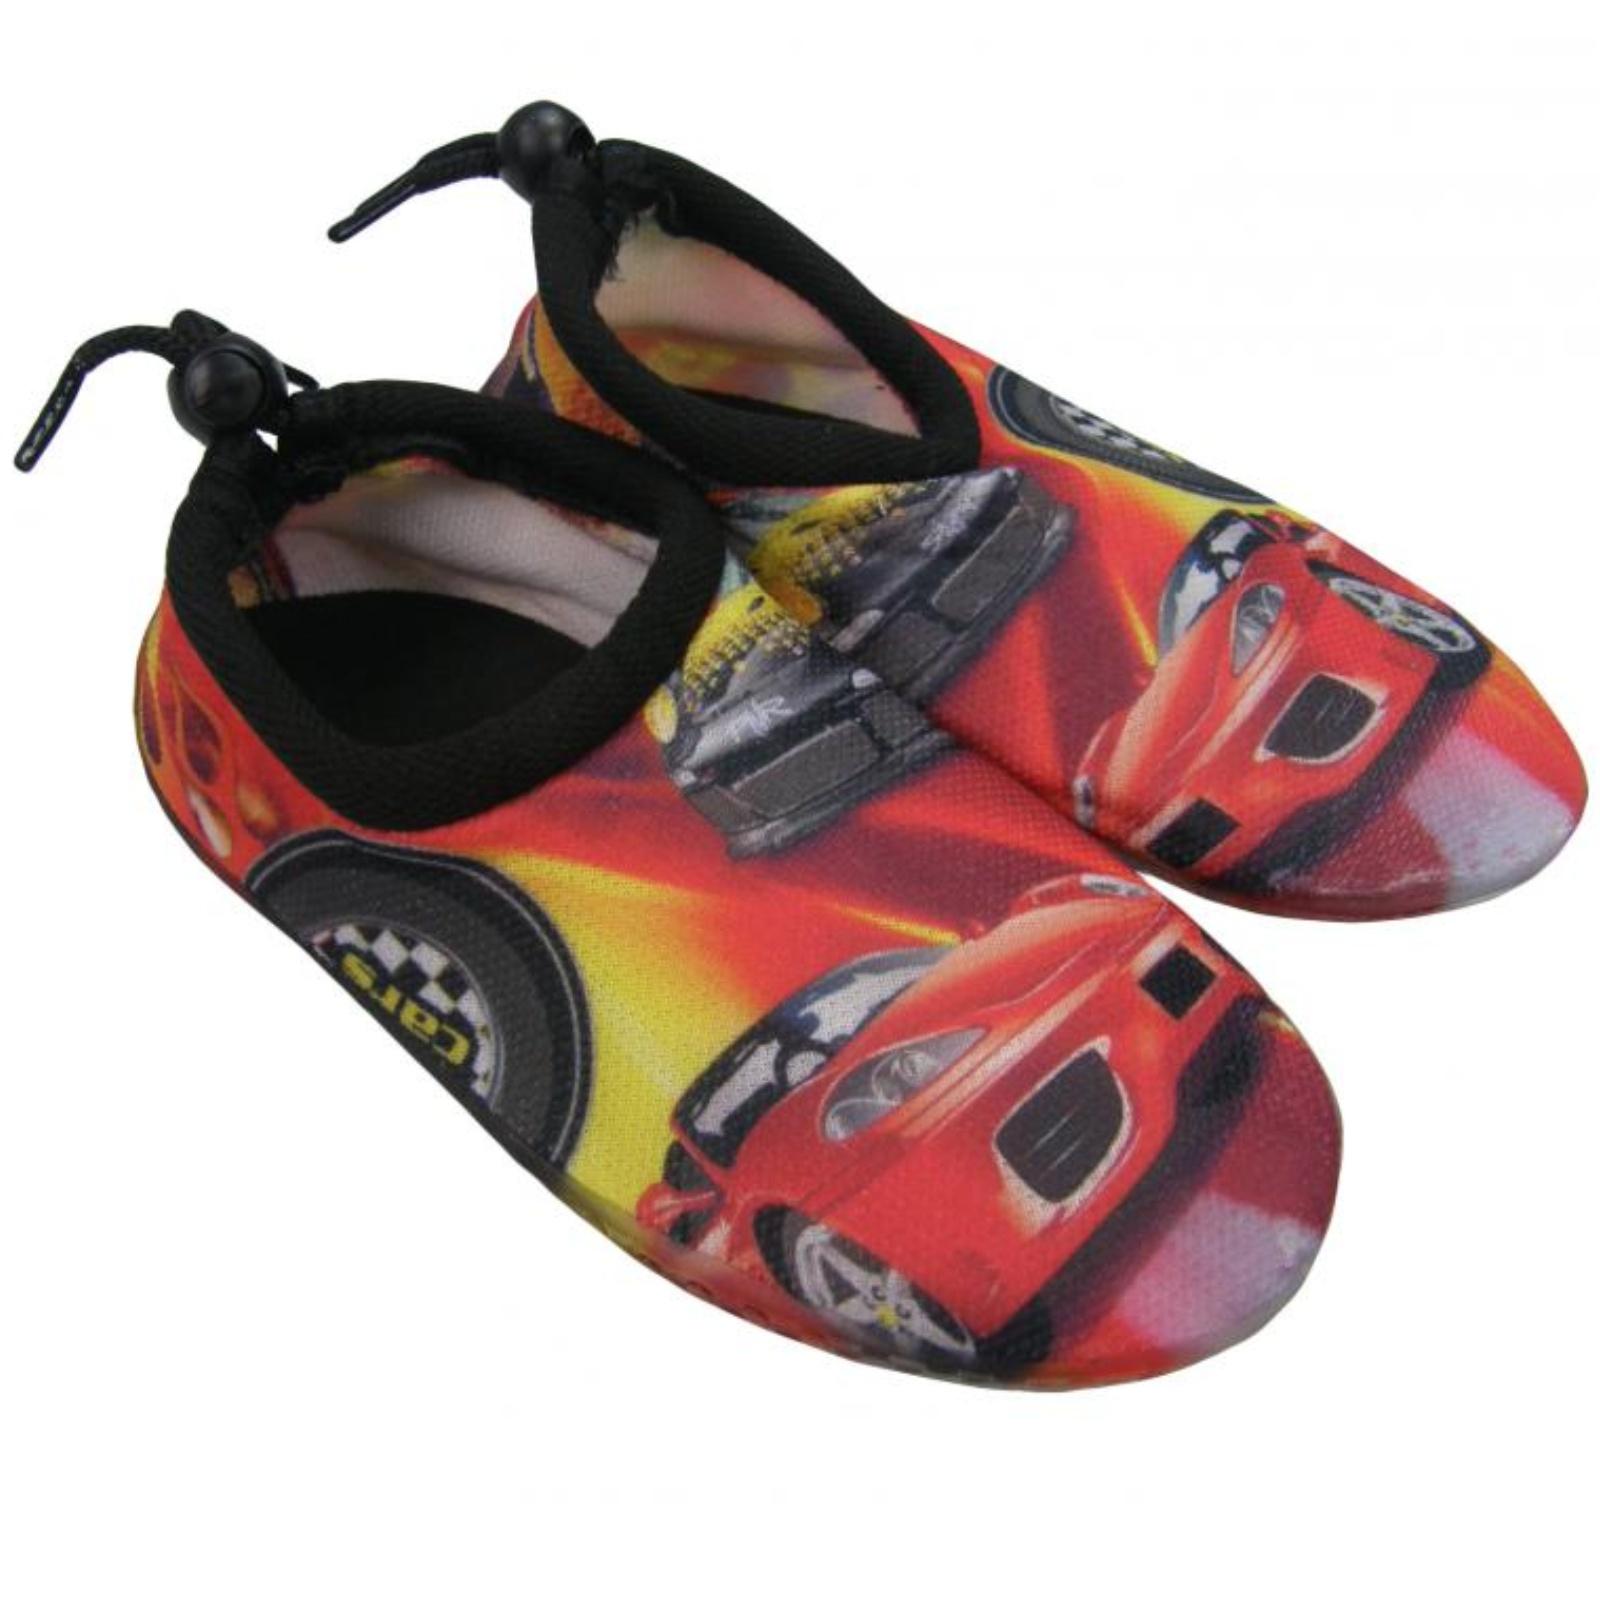 Boty do vody AQUA SURFING Cars